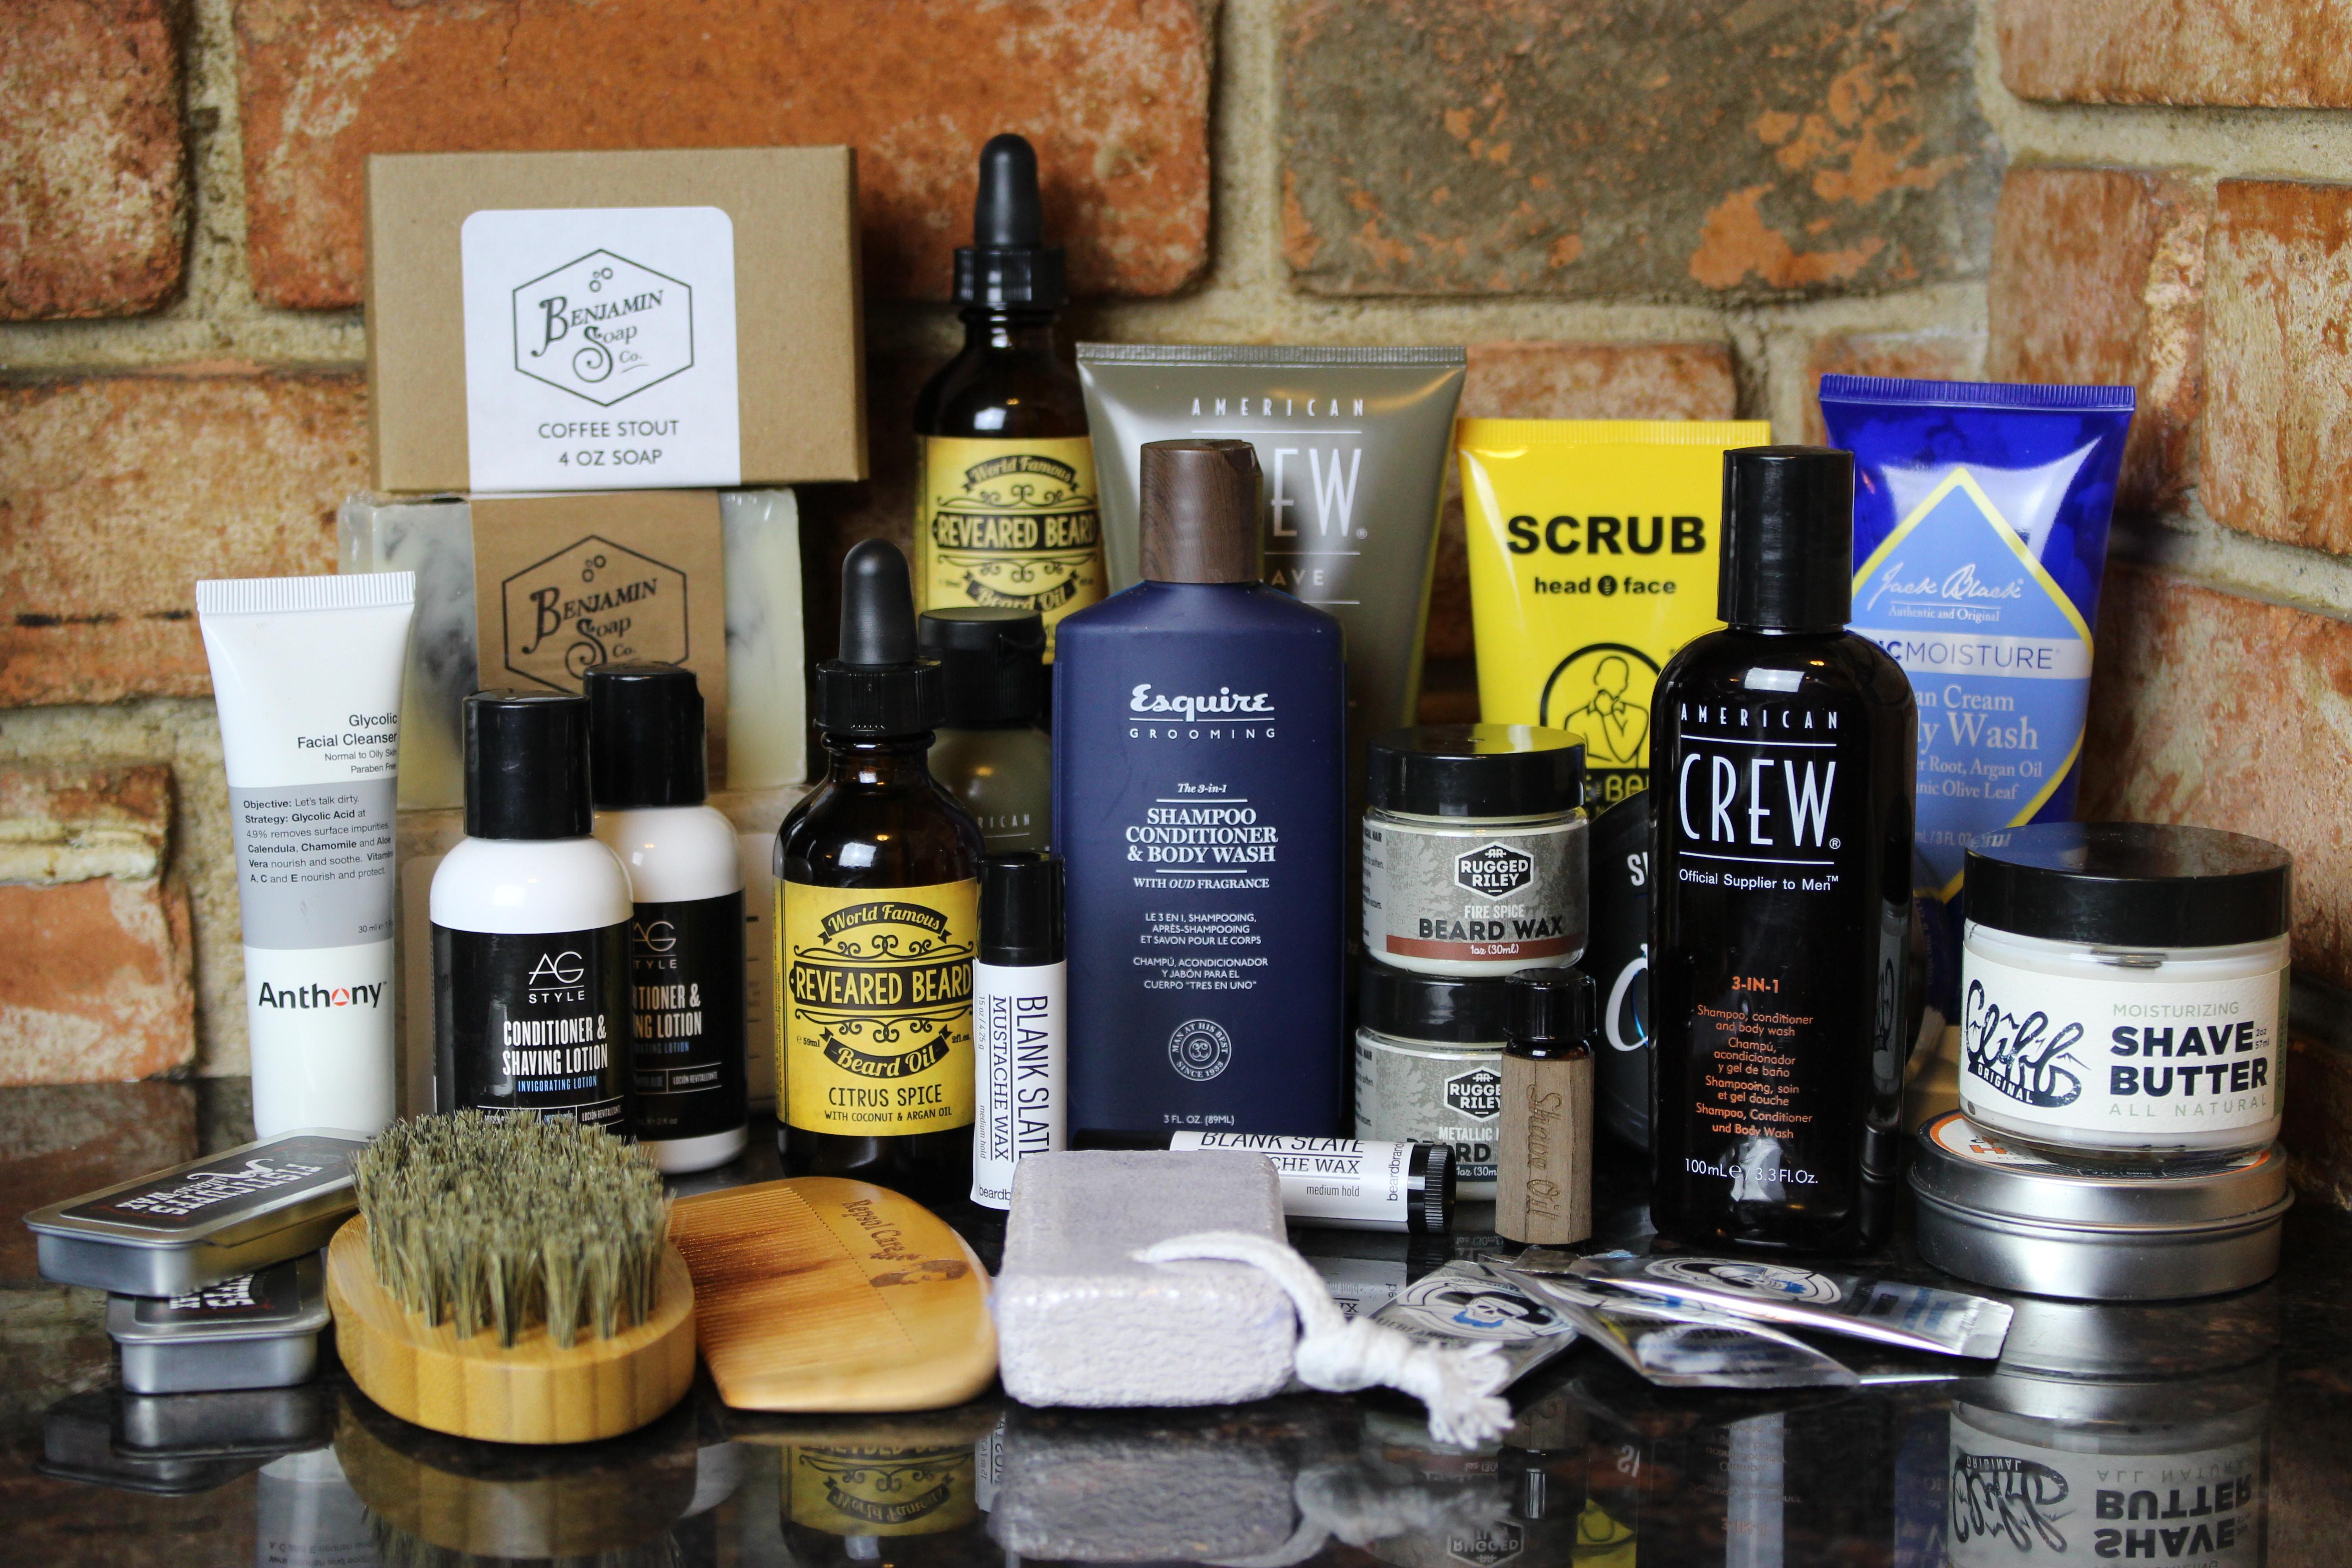 100 shaving supplies u0026 beard care services u2013 the humble barber aesop shaving. Black Bedroom Furniture Sets. Home Design Ideas